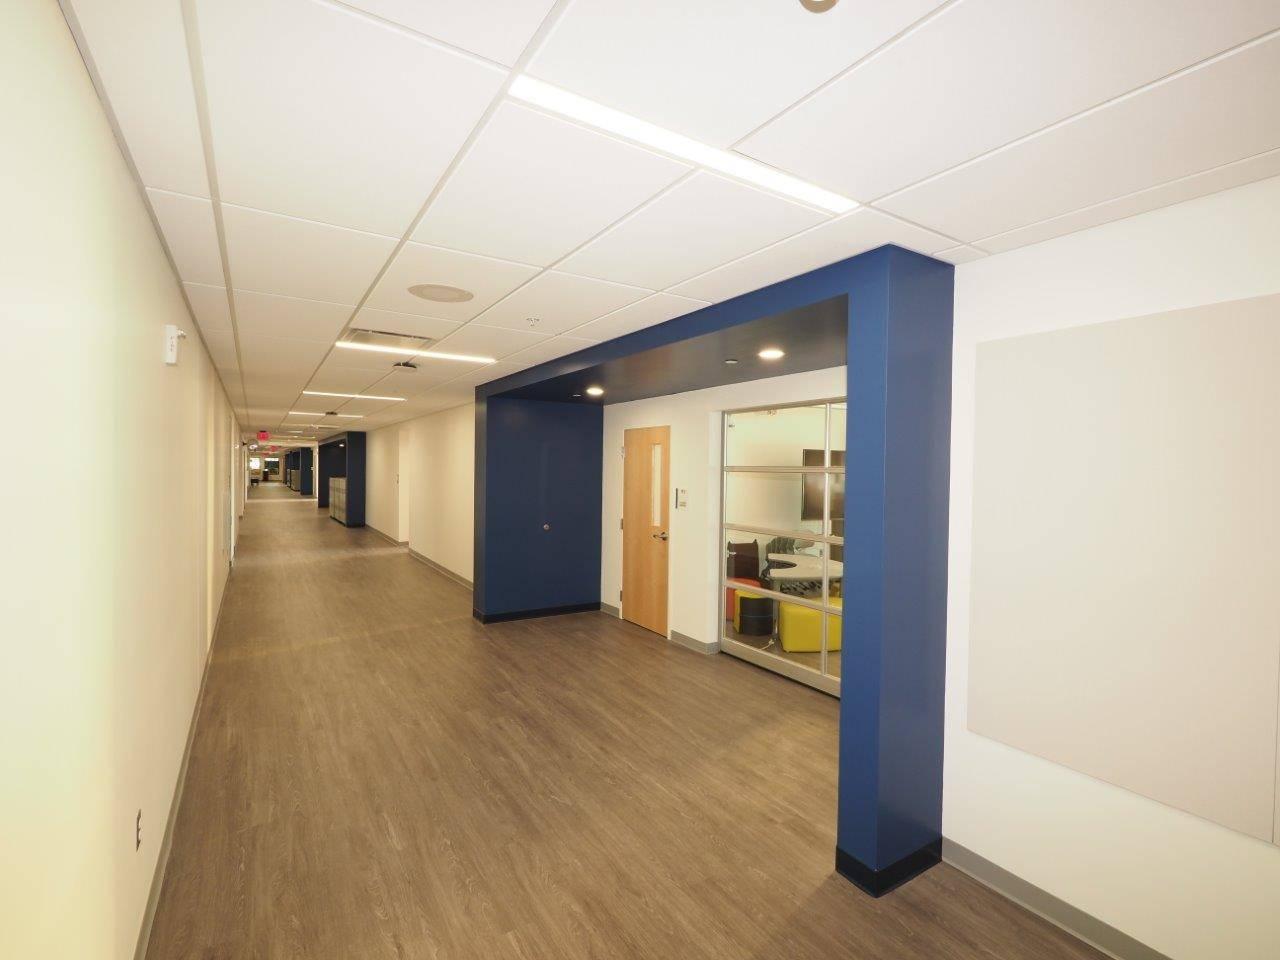 The main hallway